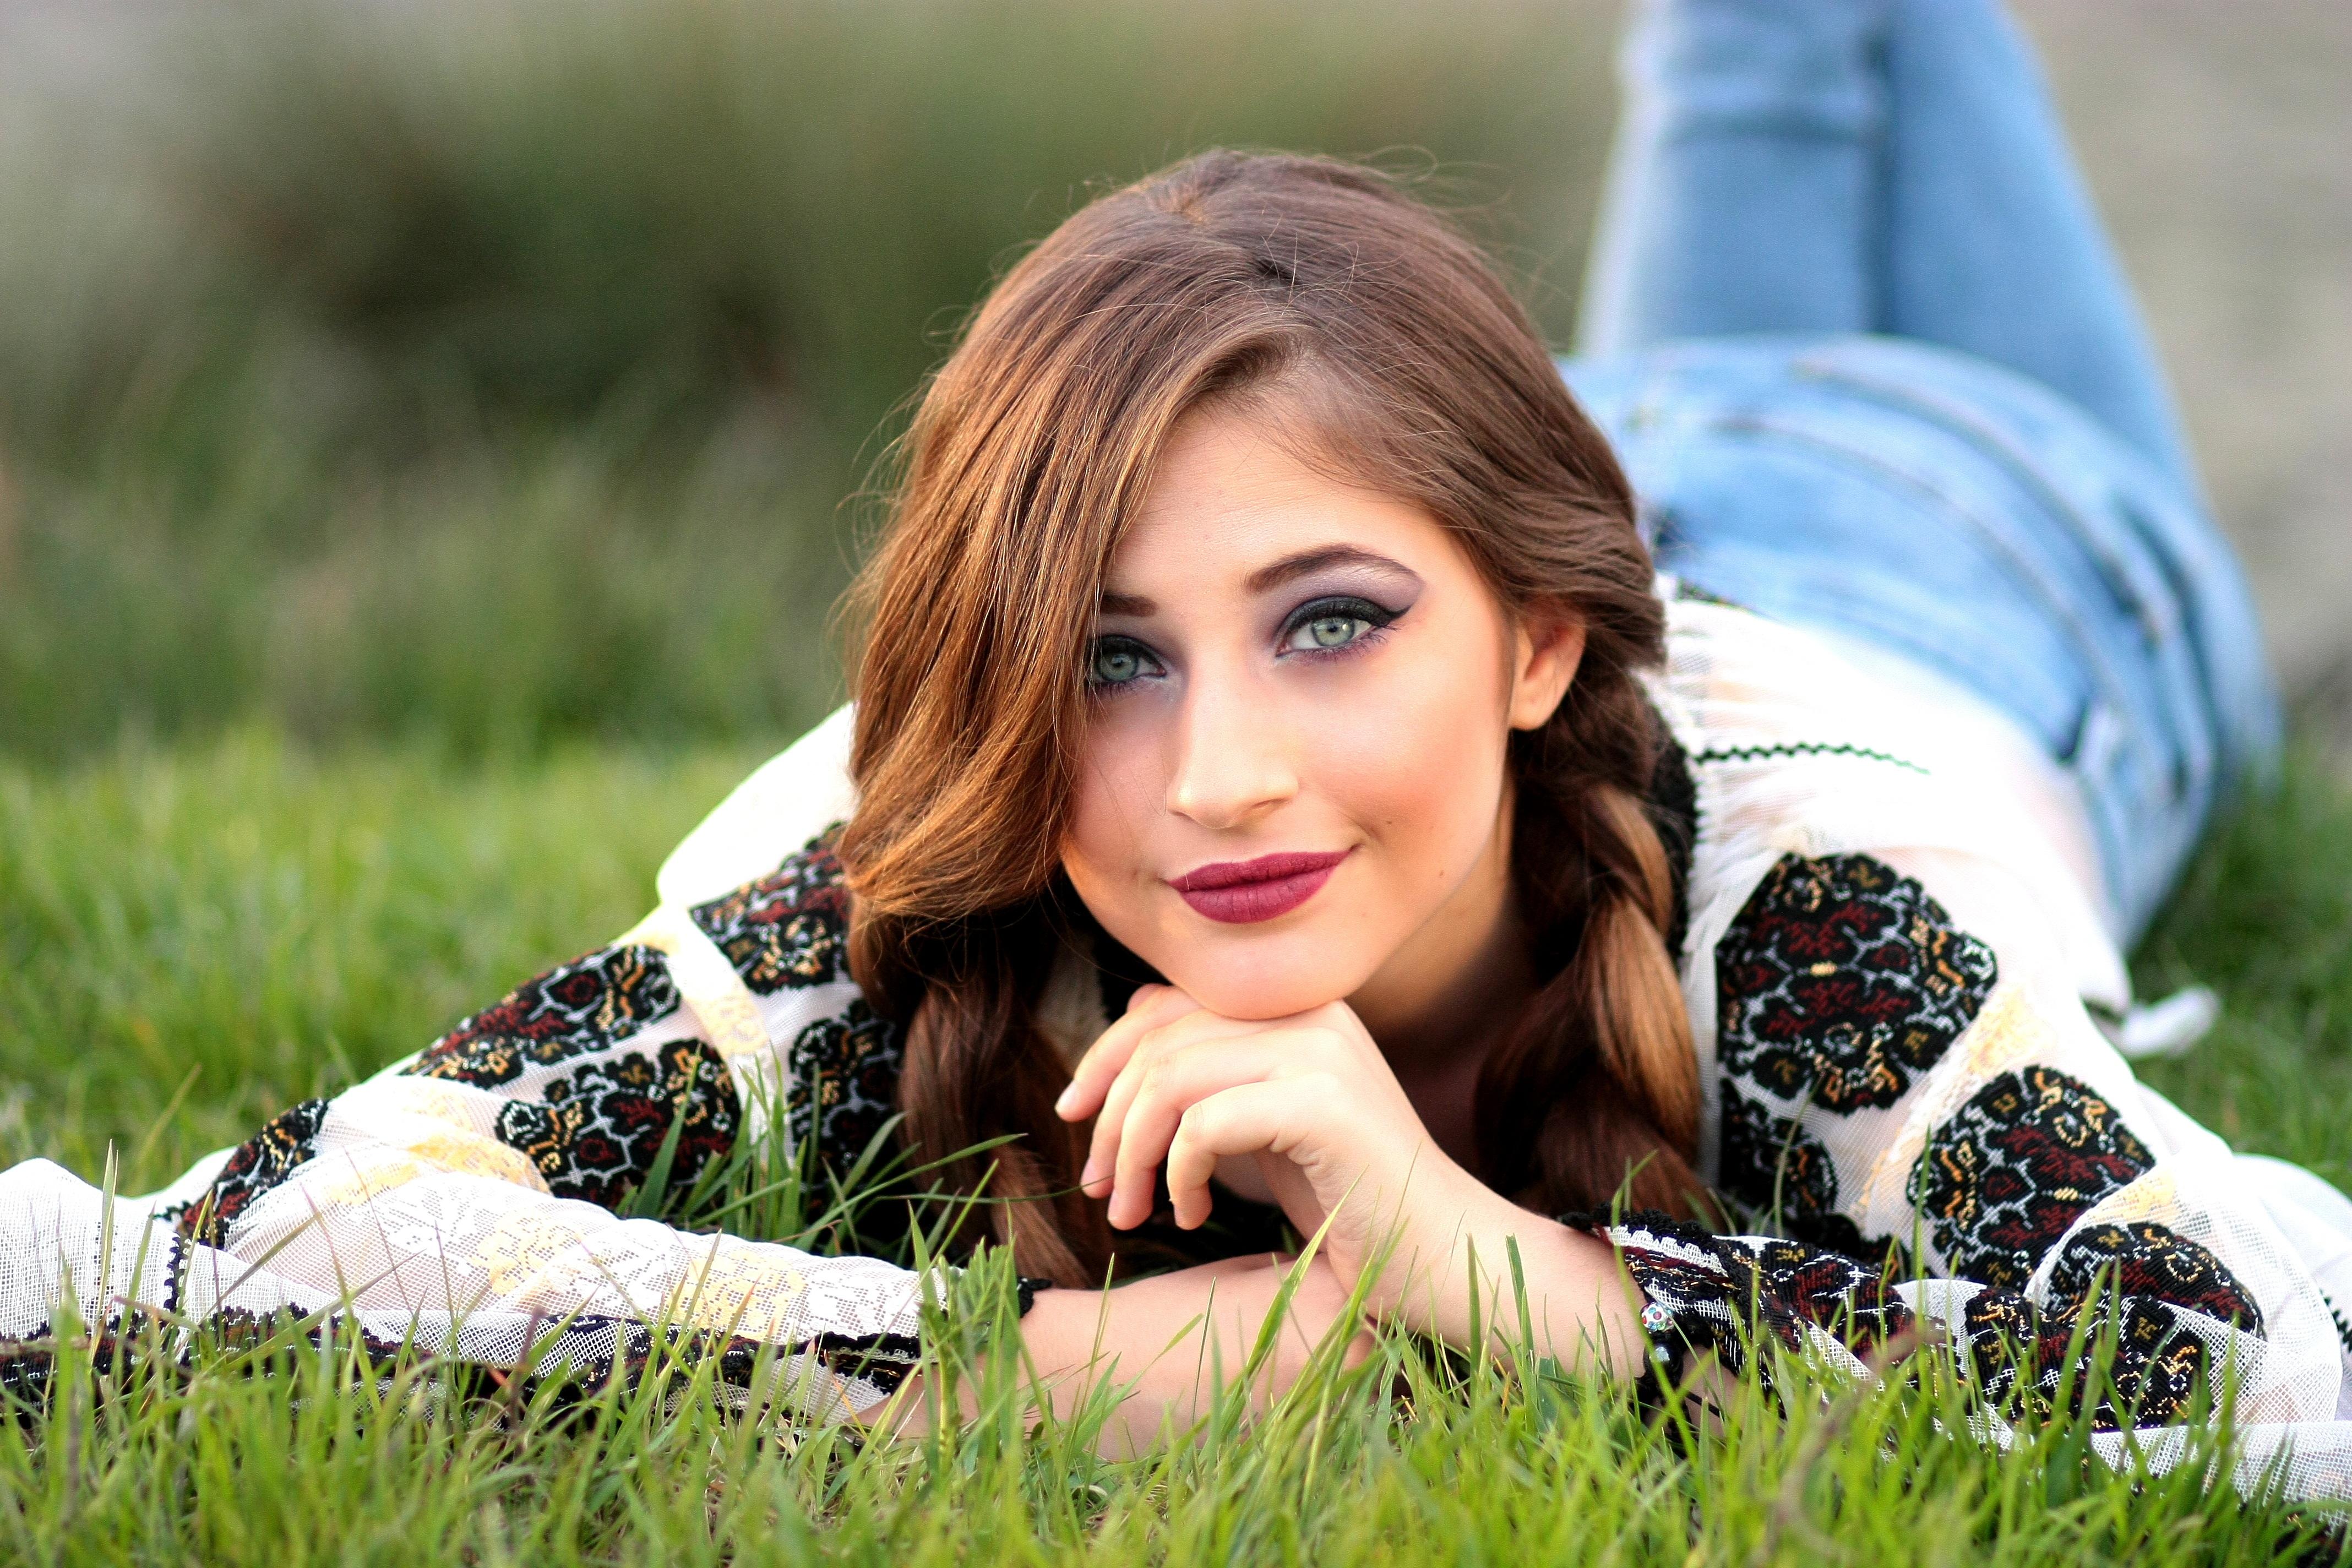 Russain teen girl pics